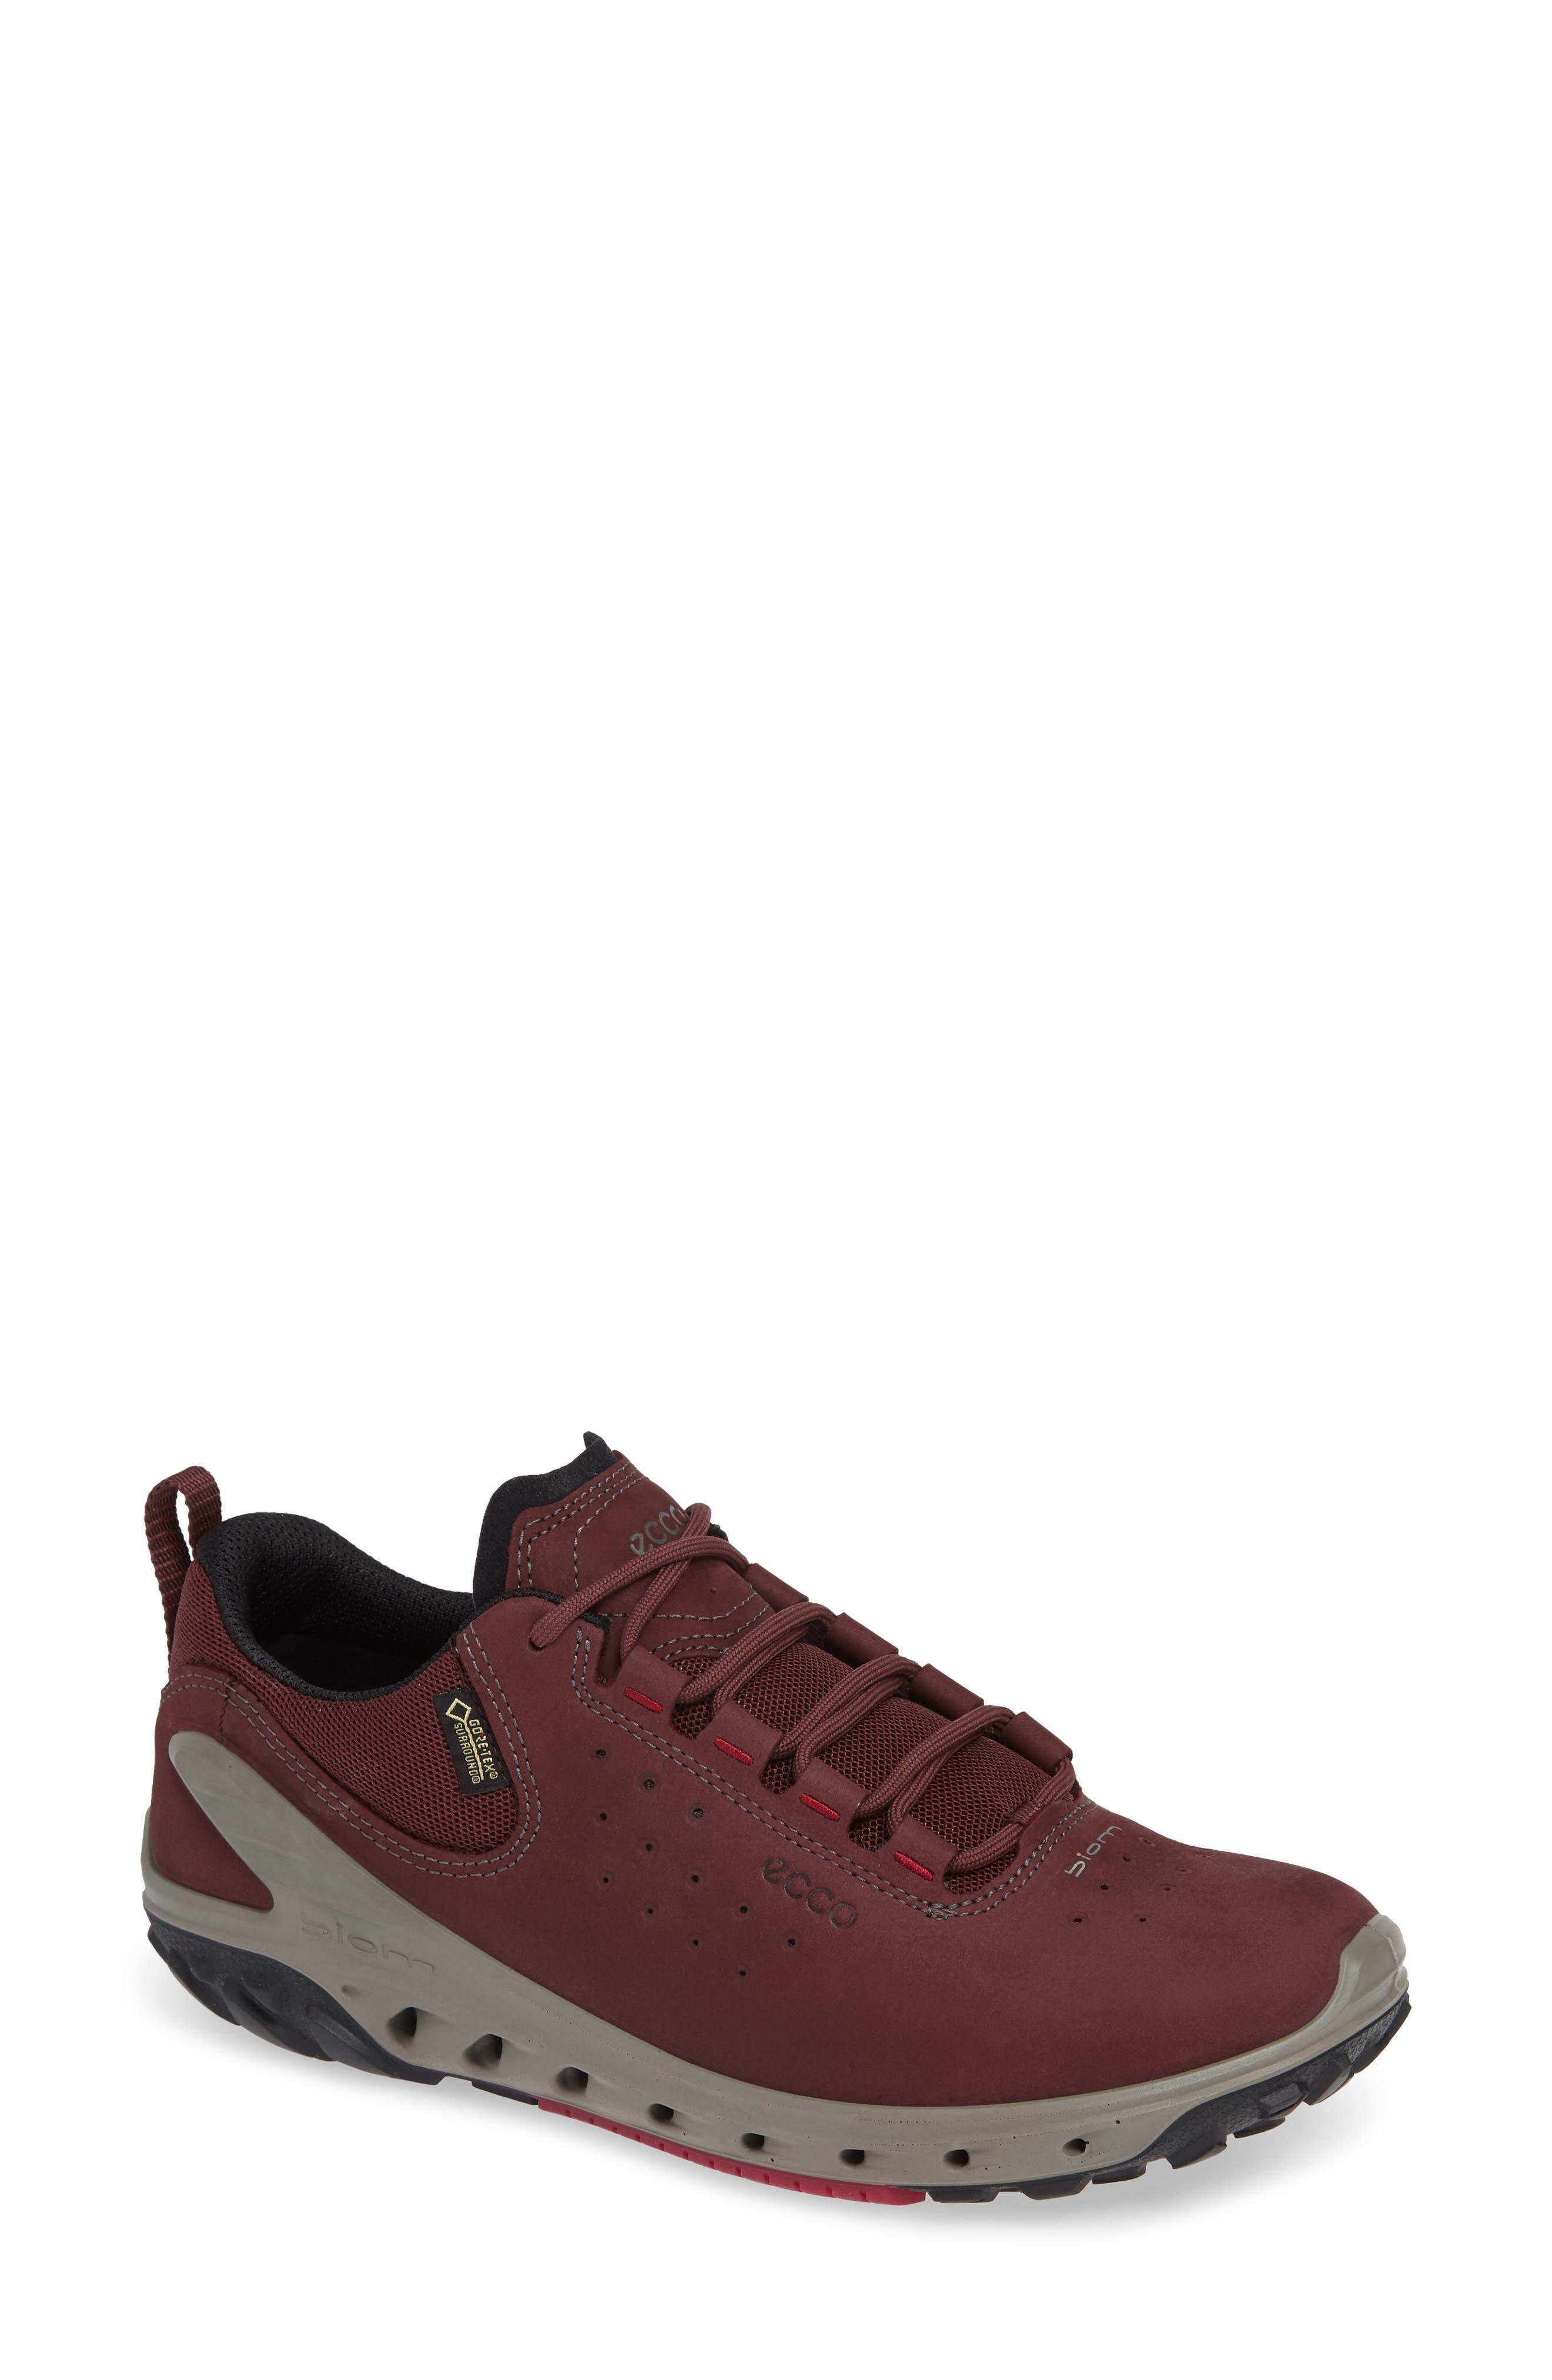 BIOM Venture GTX Sneaker,                             Main thumbnail 1, color,                             WINE NUBUCK LEATHER